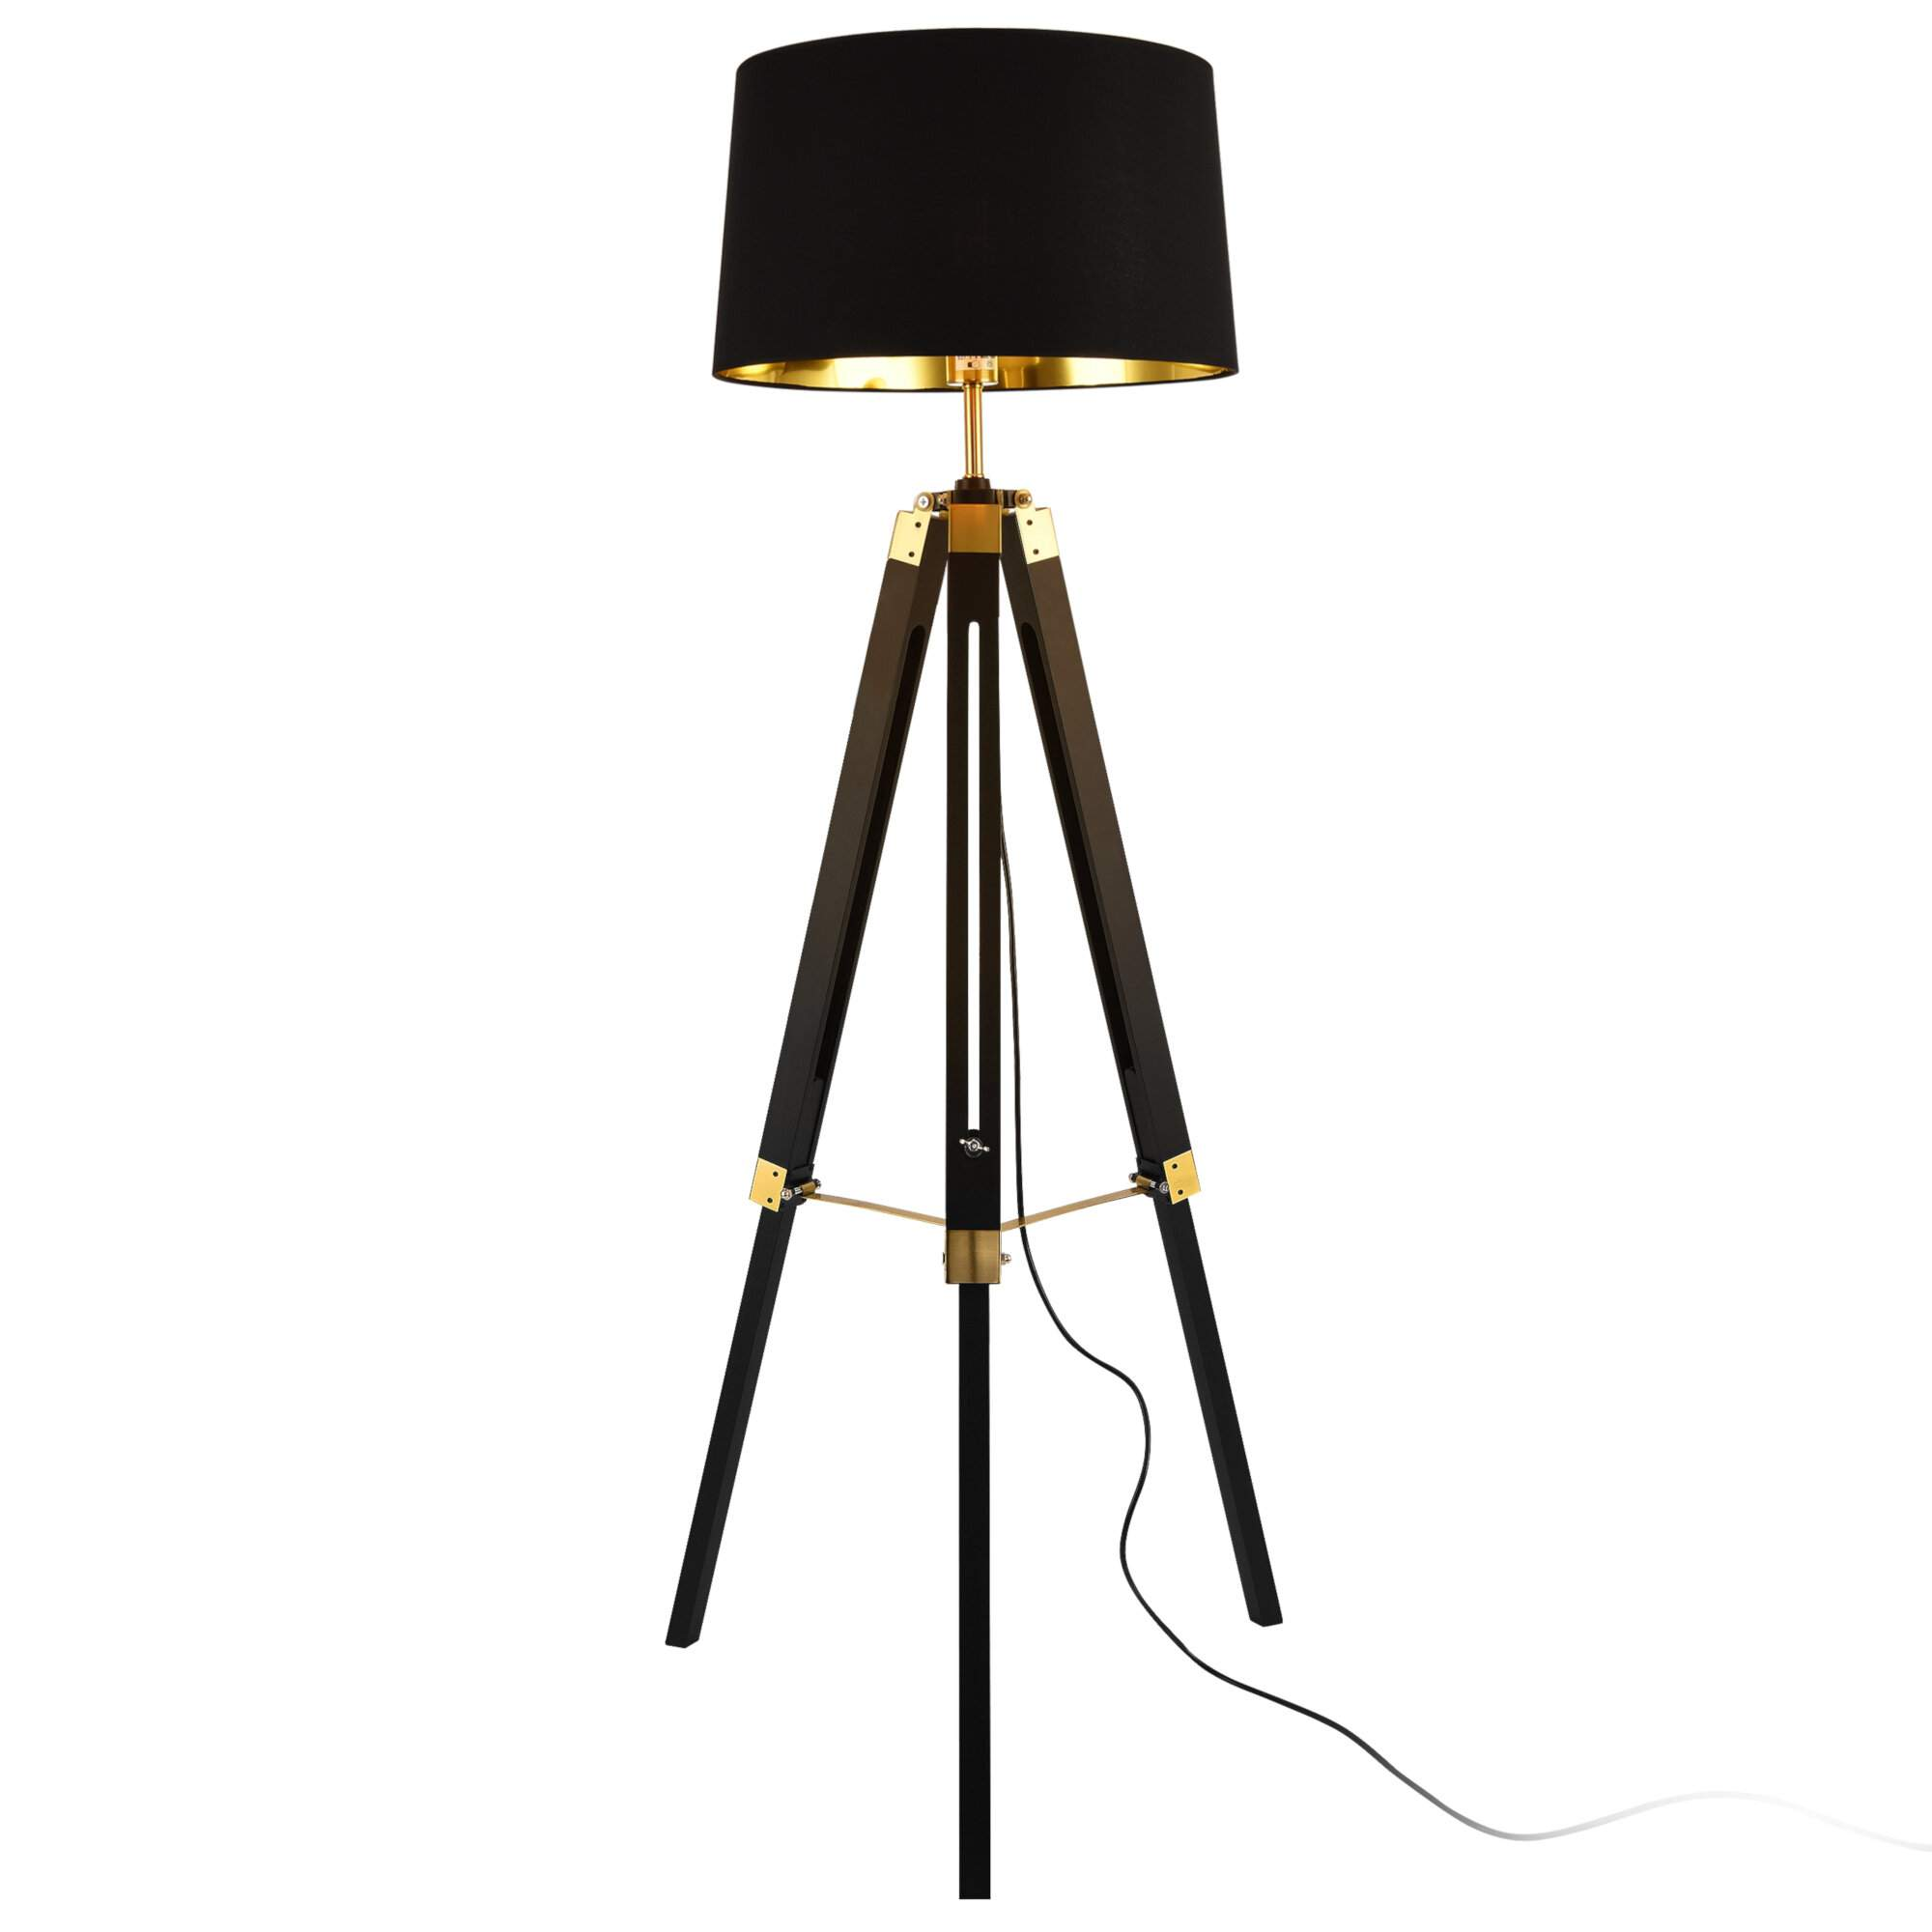 Stehlampe Garten Neu 145 Cm TriPod Stehlampe Bierce